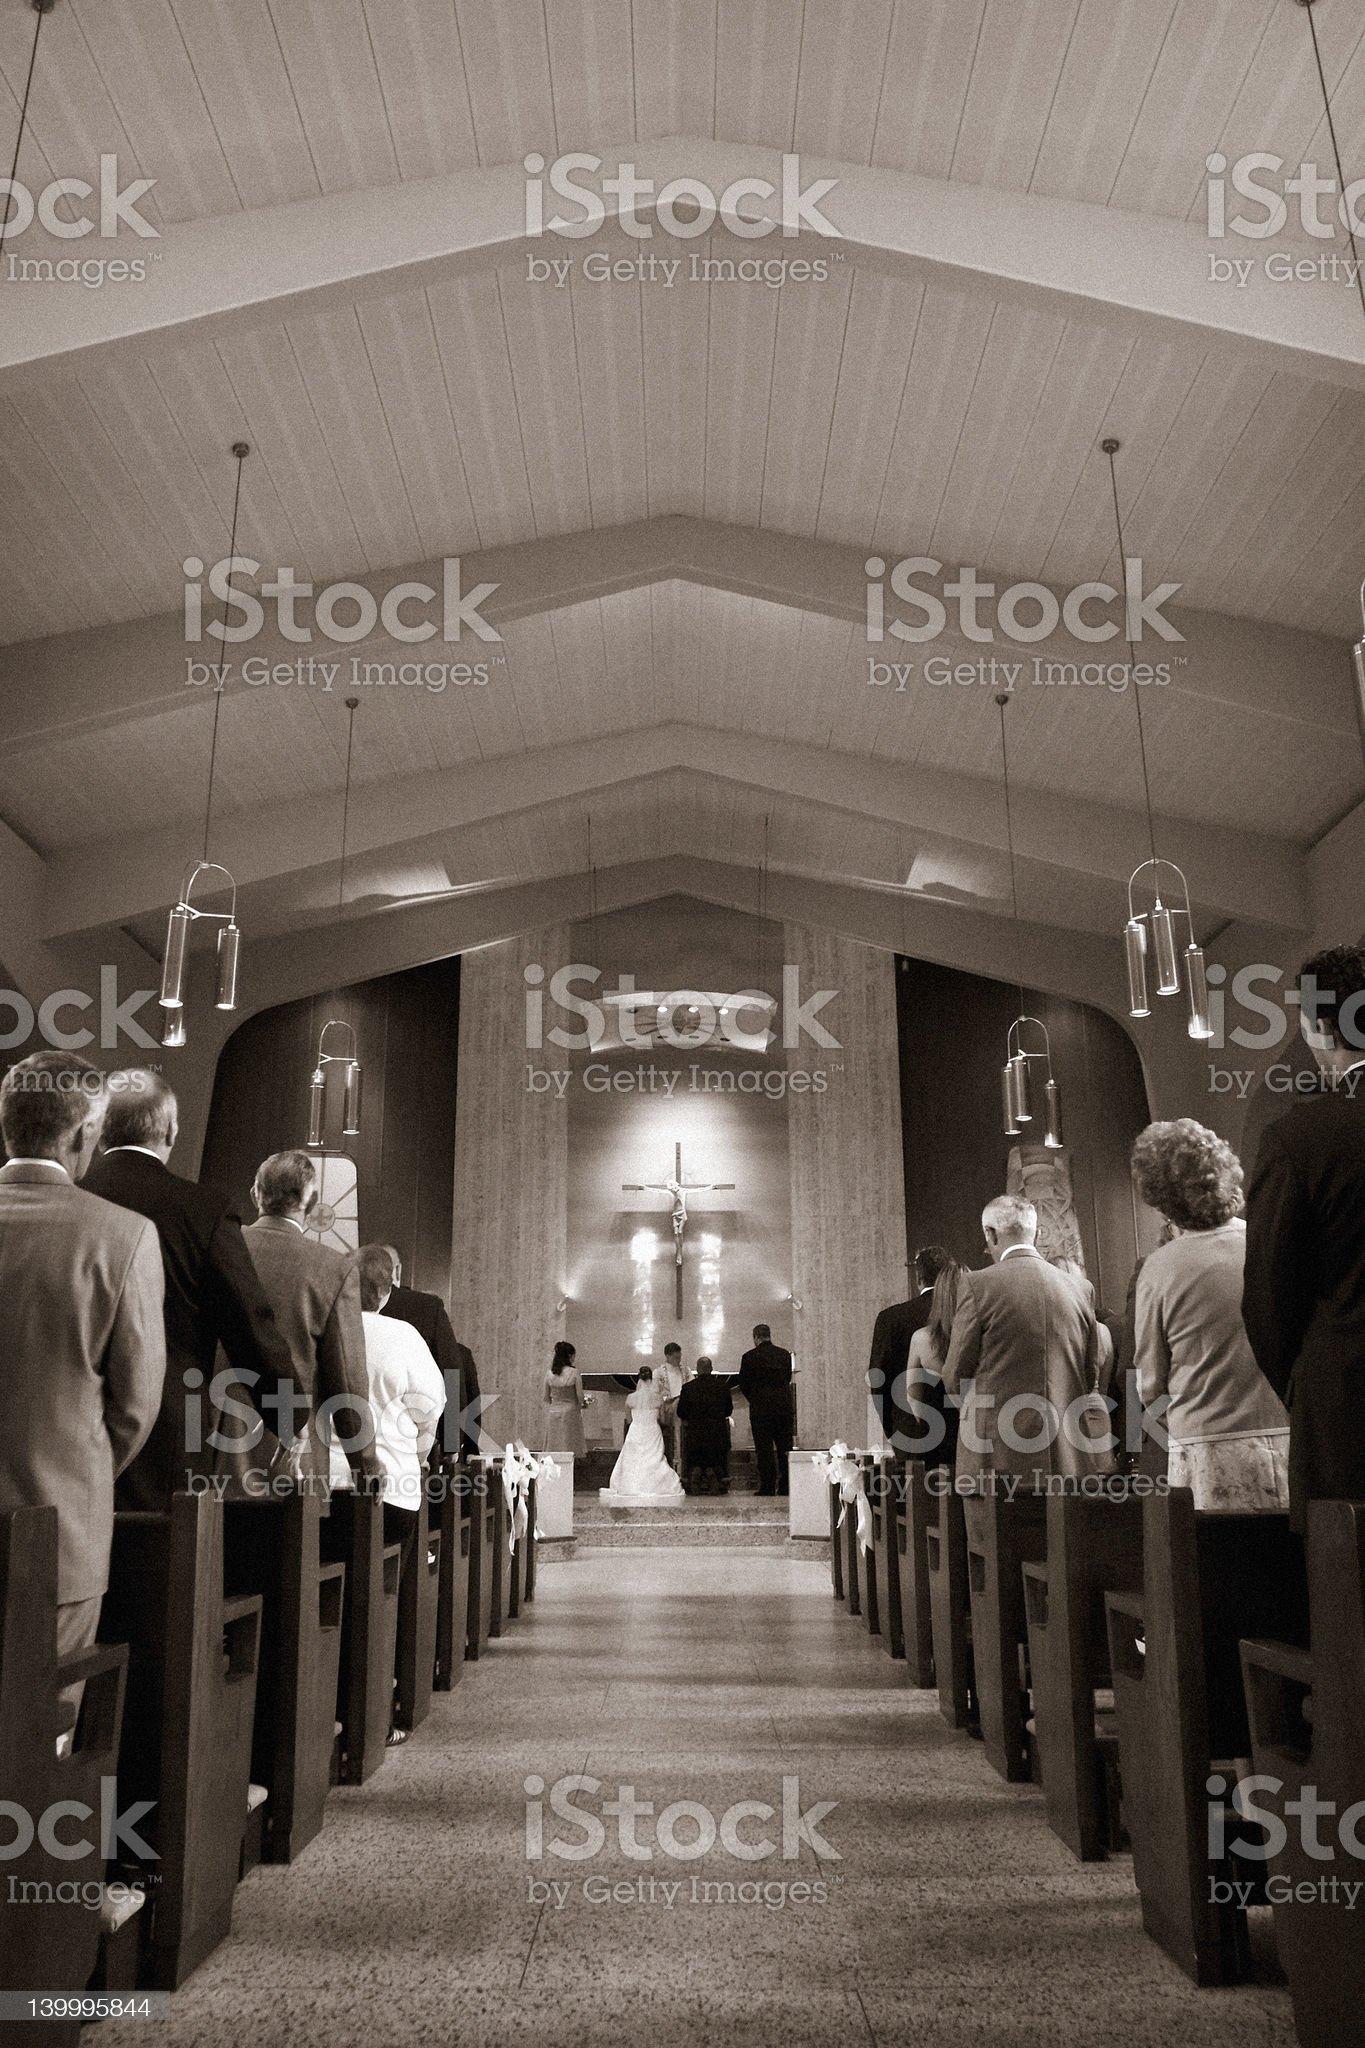 Wedding at a church royalty-free stock photo